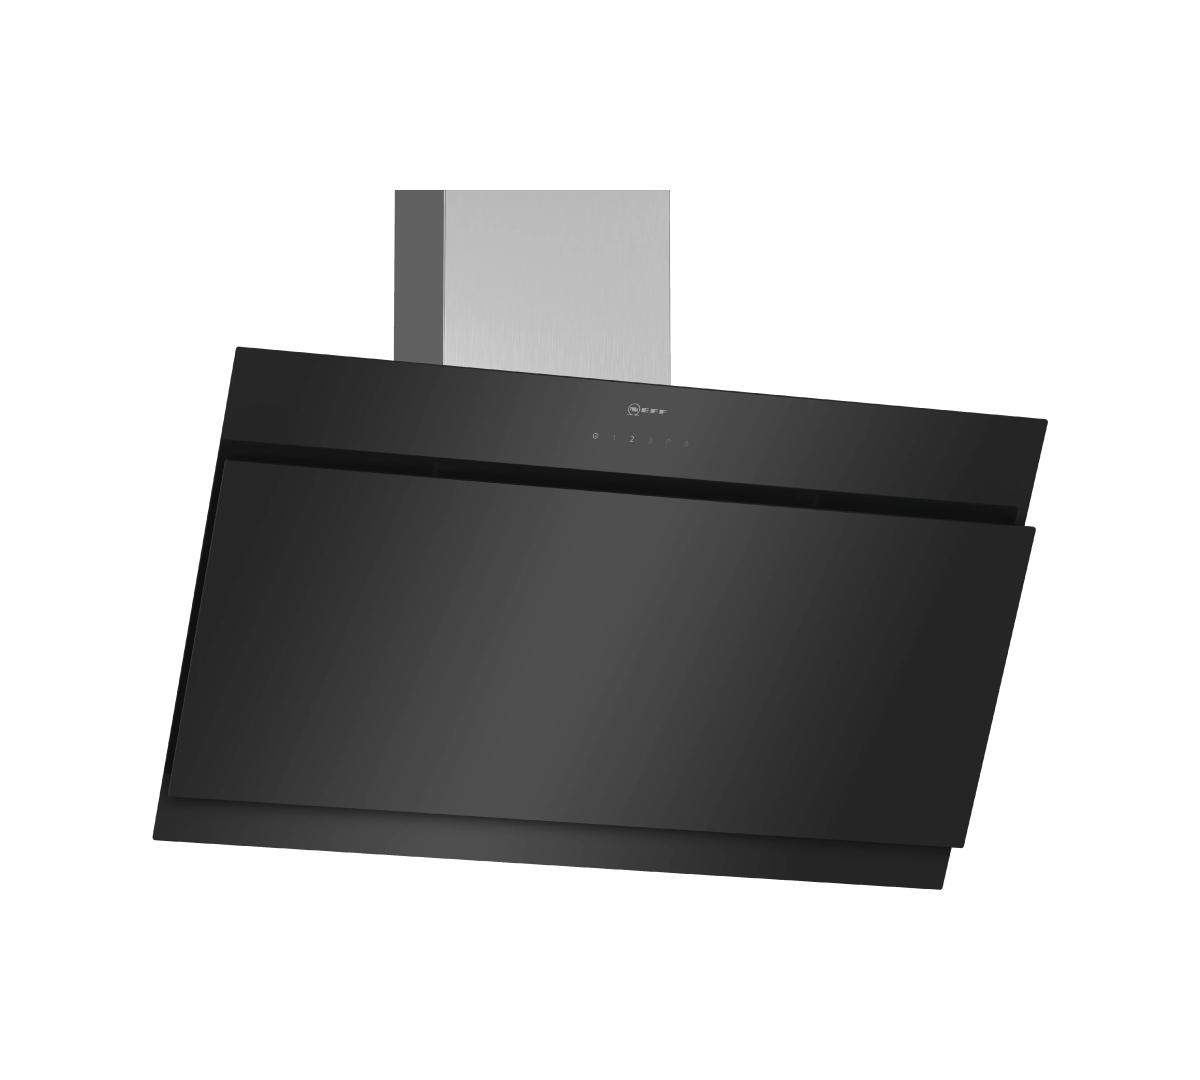 N50Wall-mounted cooker hood90 cmclear glass black printed